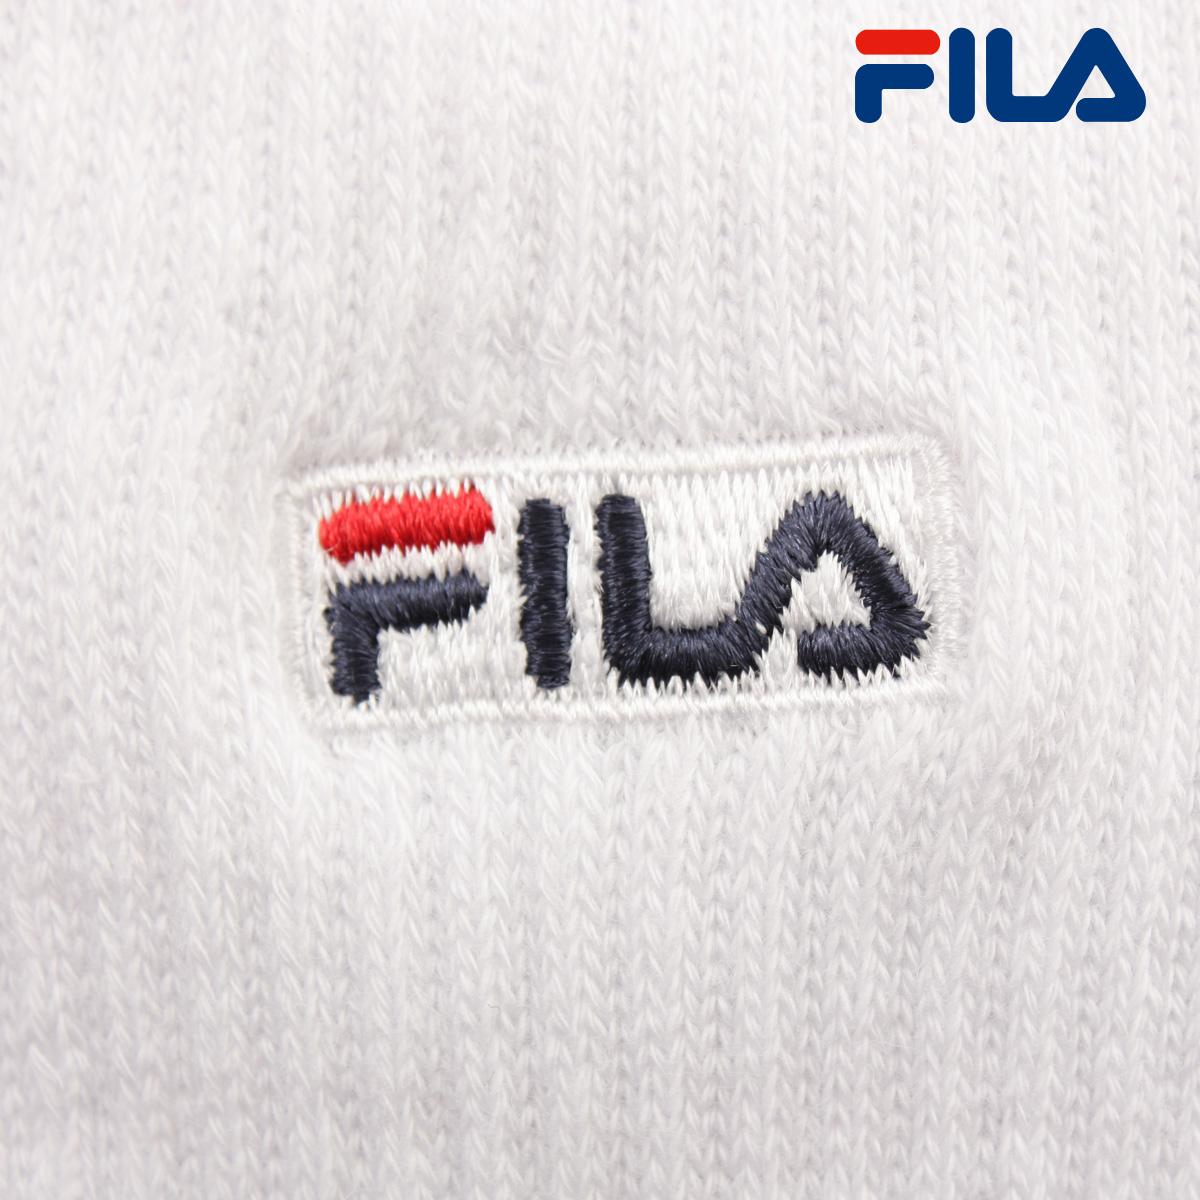 Аксессуары для спорта Fila 20745412/b03 20745412-B03